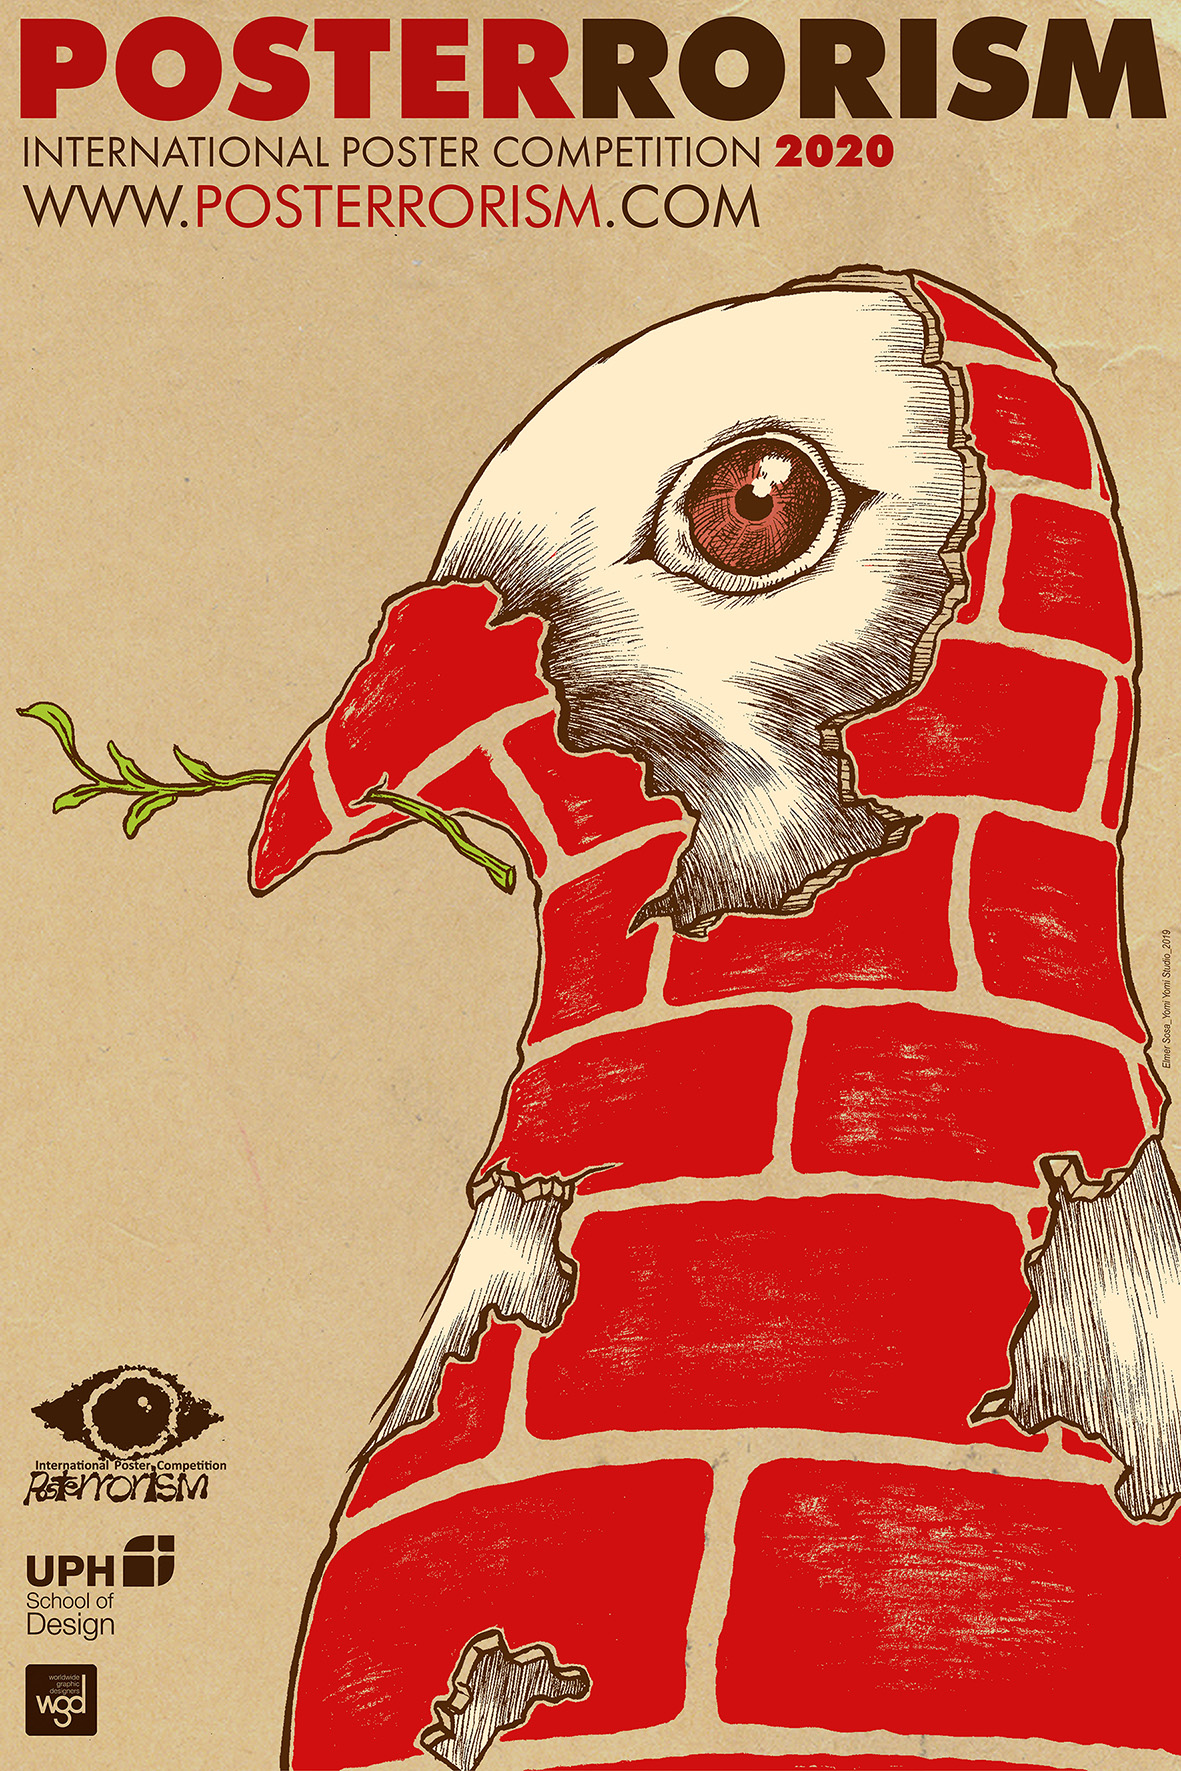 posterrorism2020 poster design by Elmer Sosa